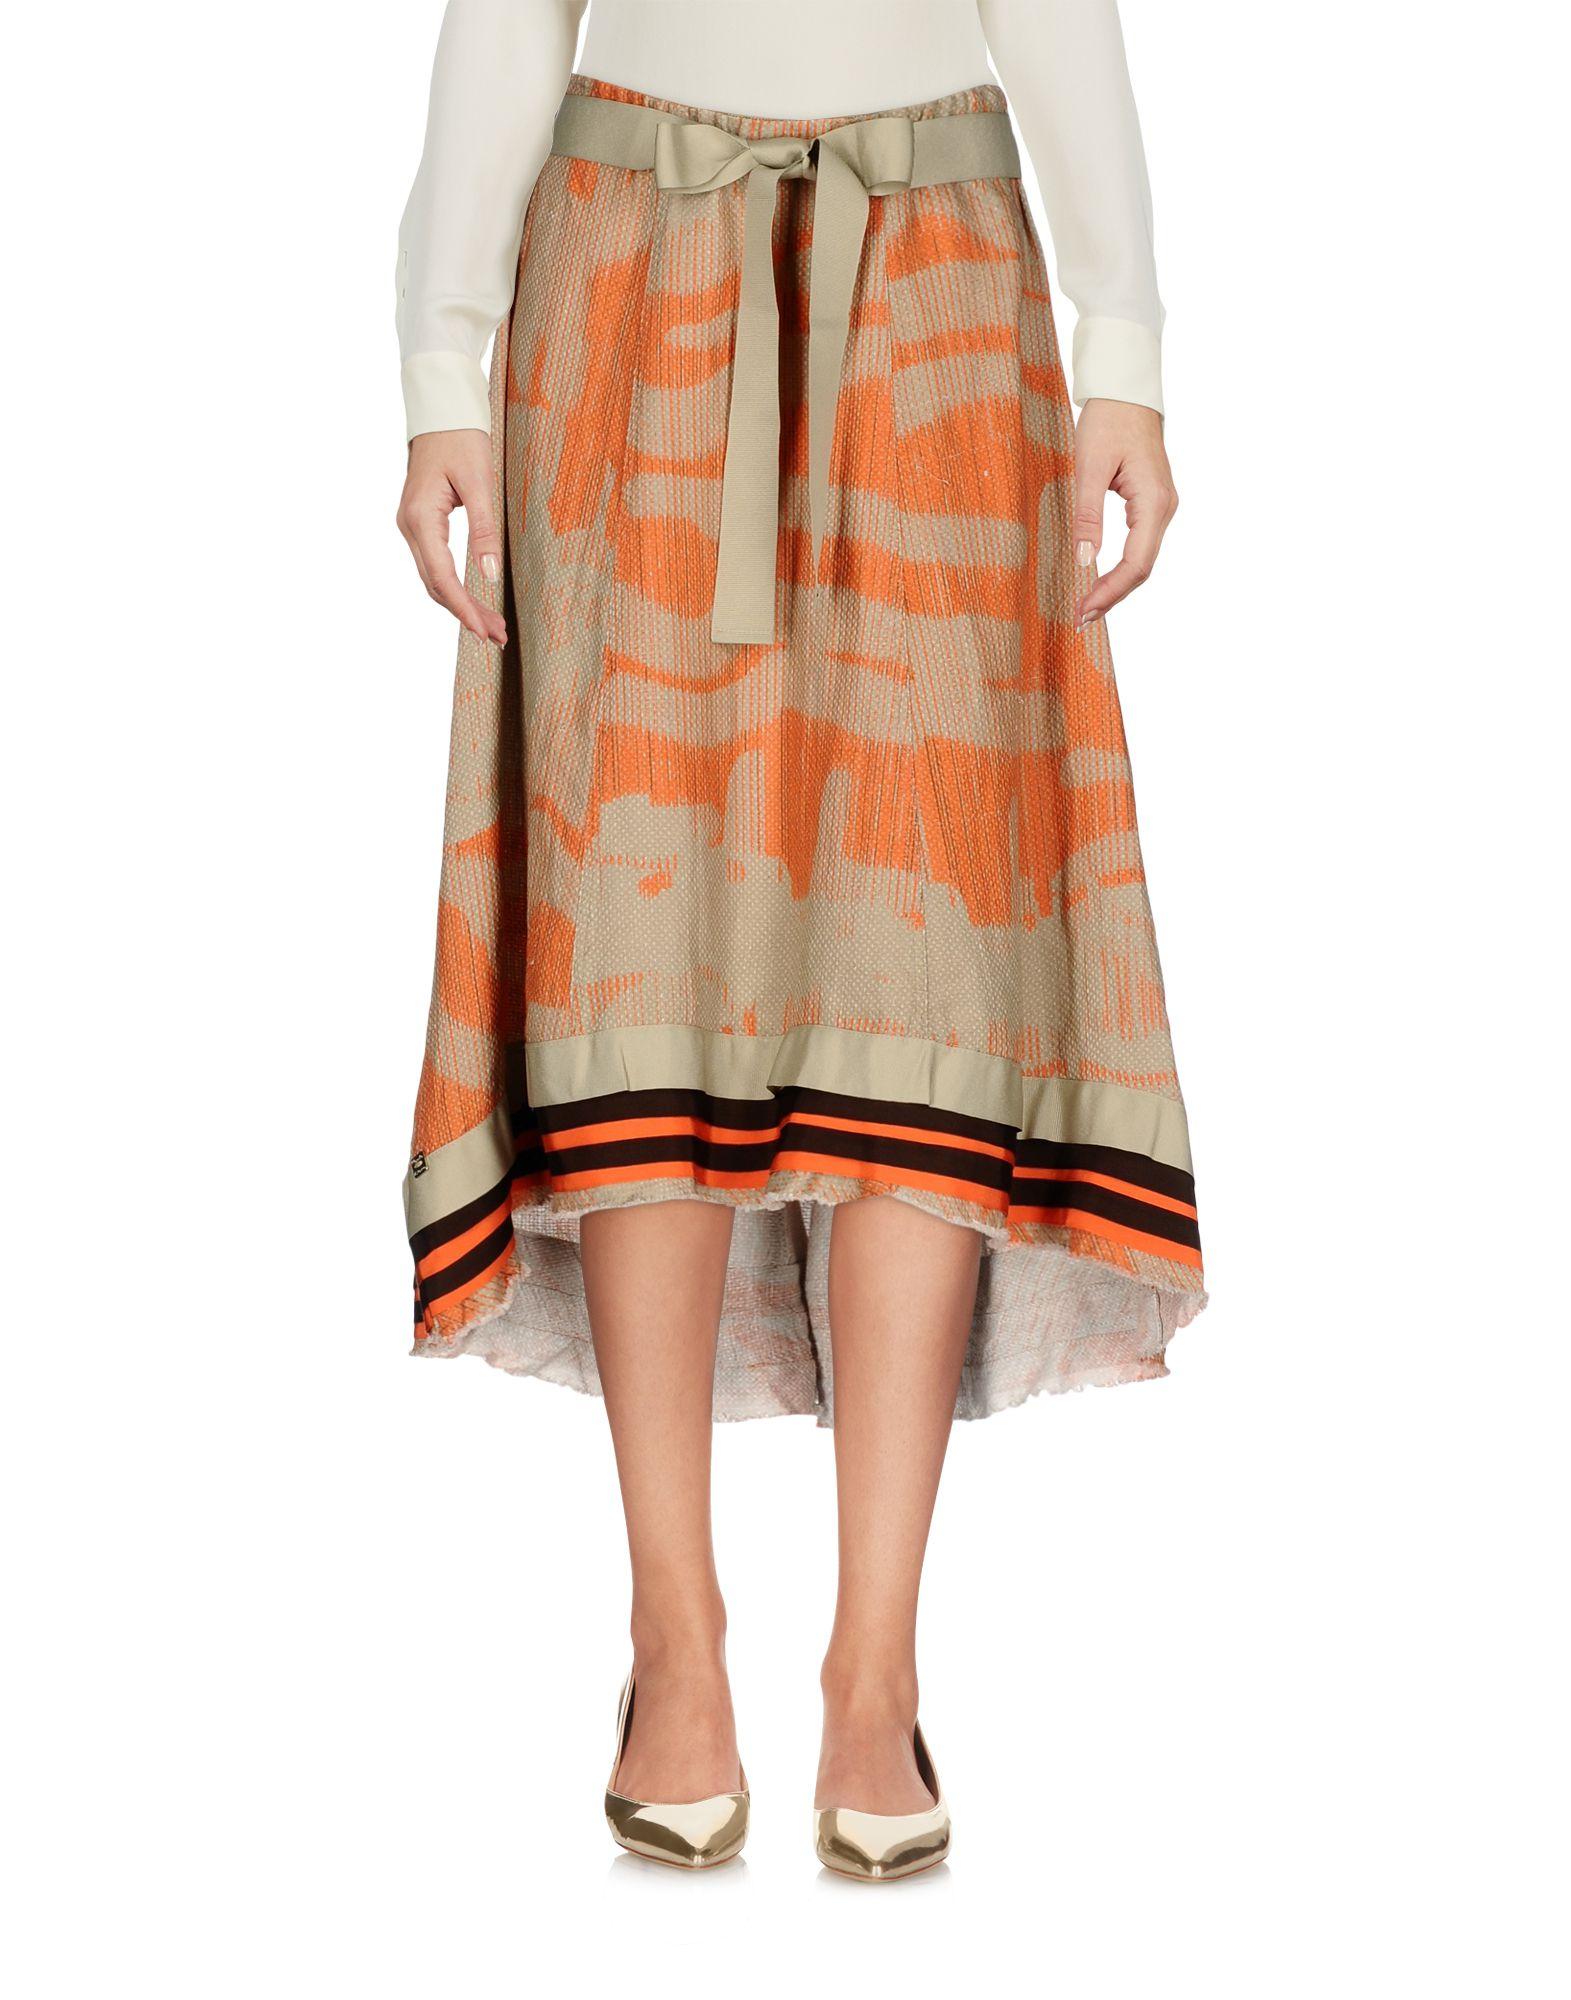 MANILA GRACE Юбка миди костюм пиджак юбка пояс avemod костюм пиджак юбка пояс